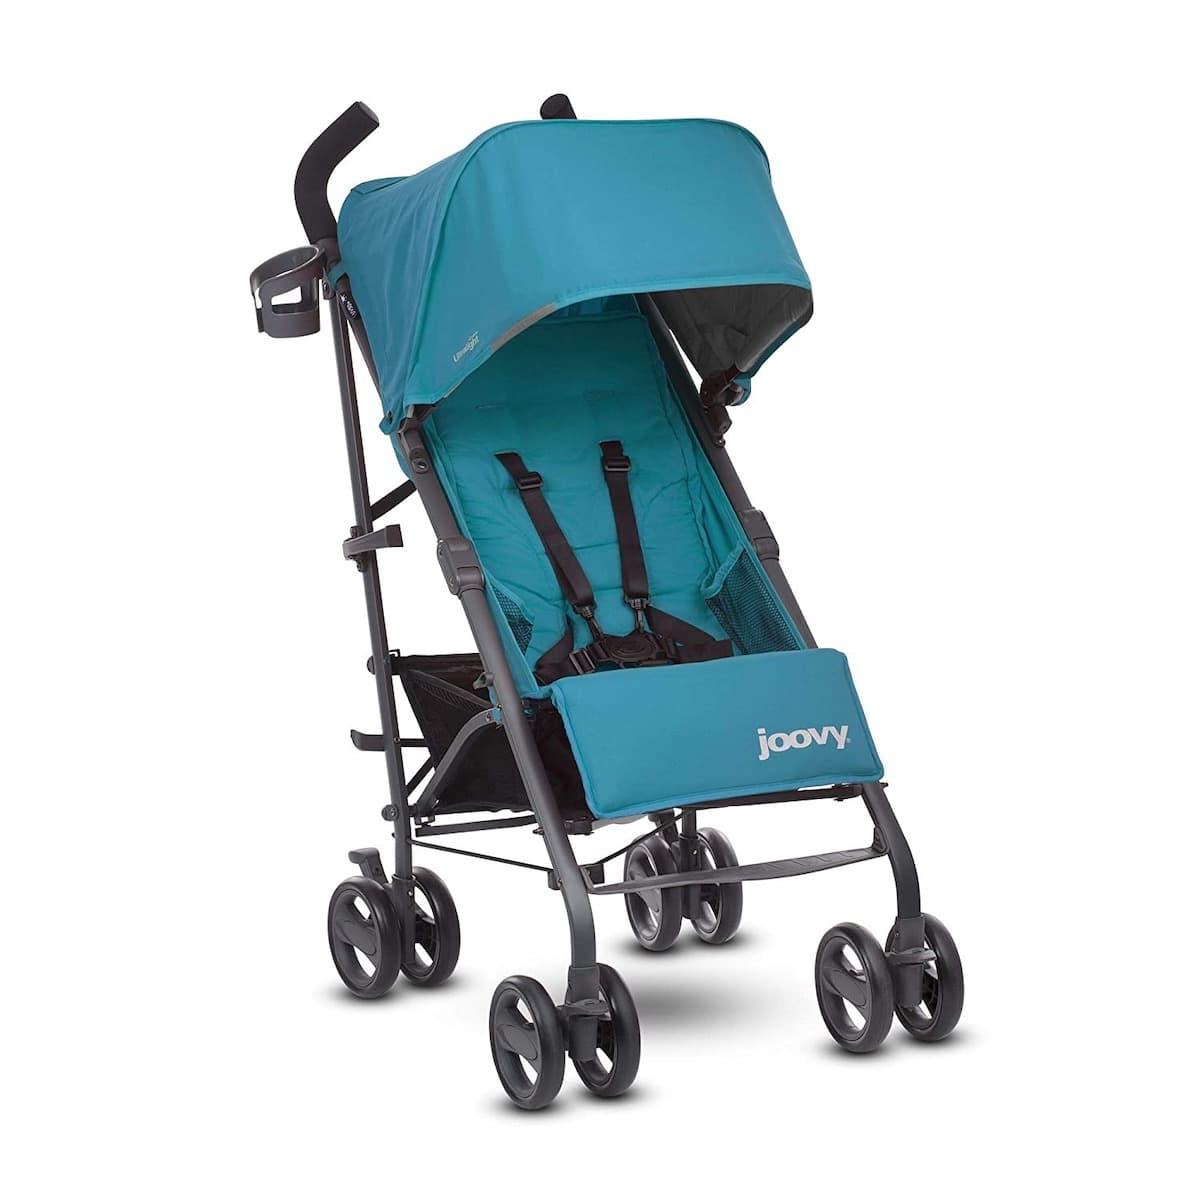 Joovy Groove Umbrella stroller for toddler